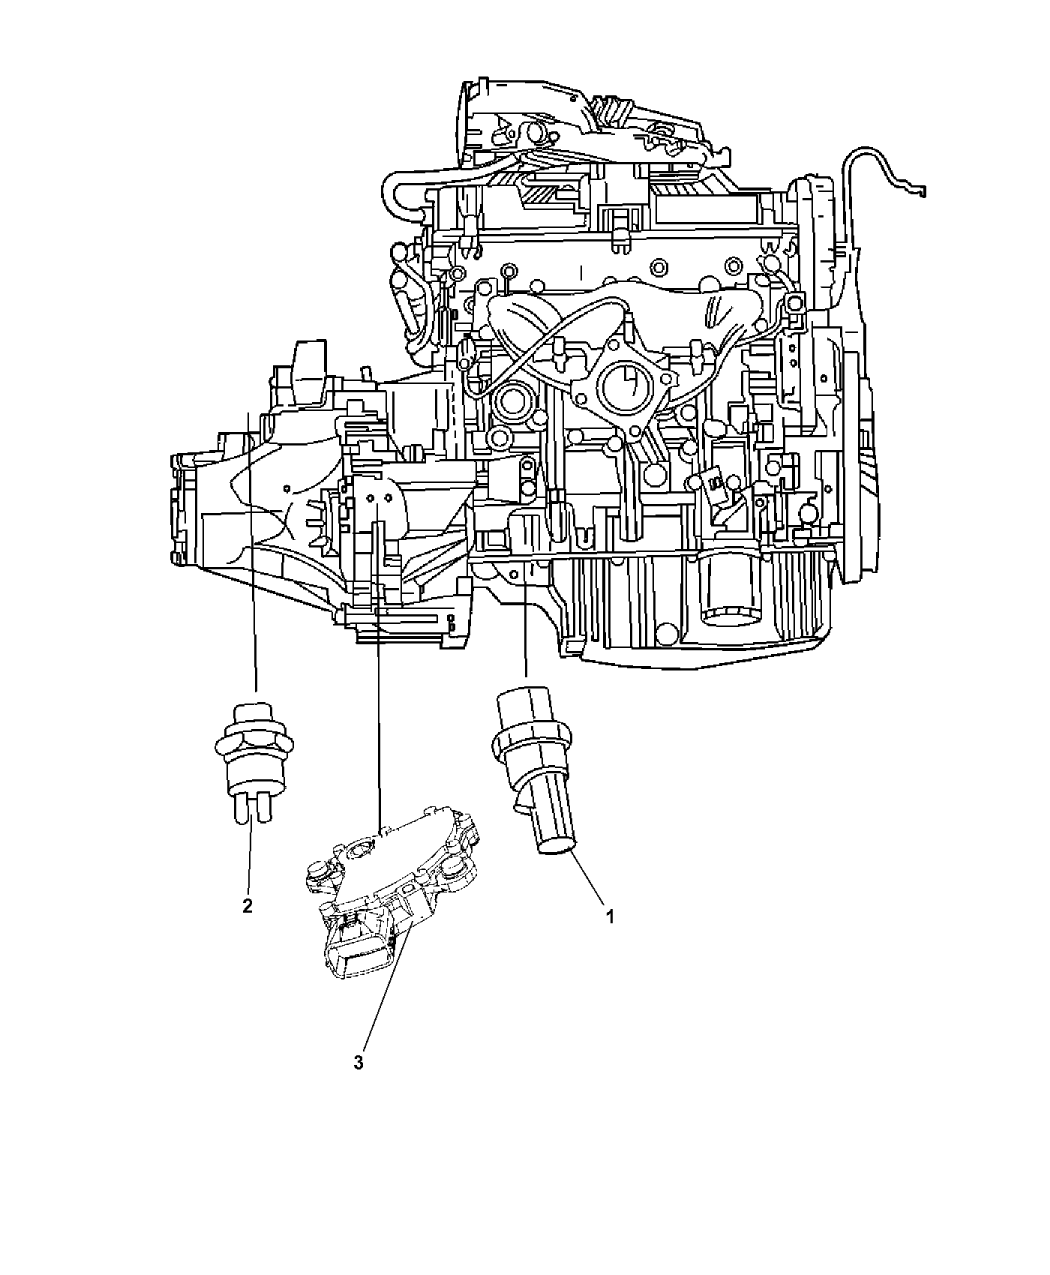 2015 Jeep Compass Switches Powertrain Mopar Parts Giant Wiring Diagram